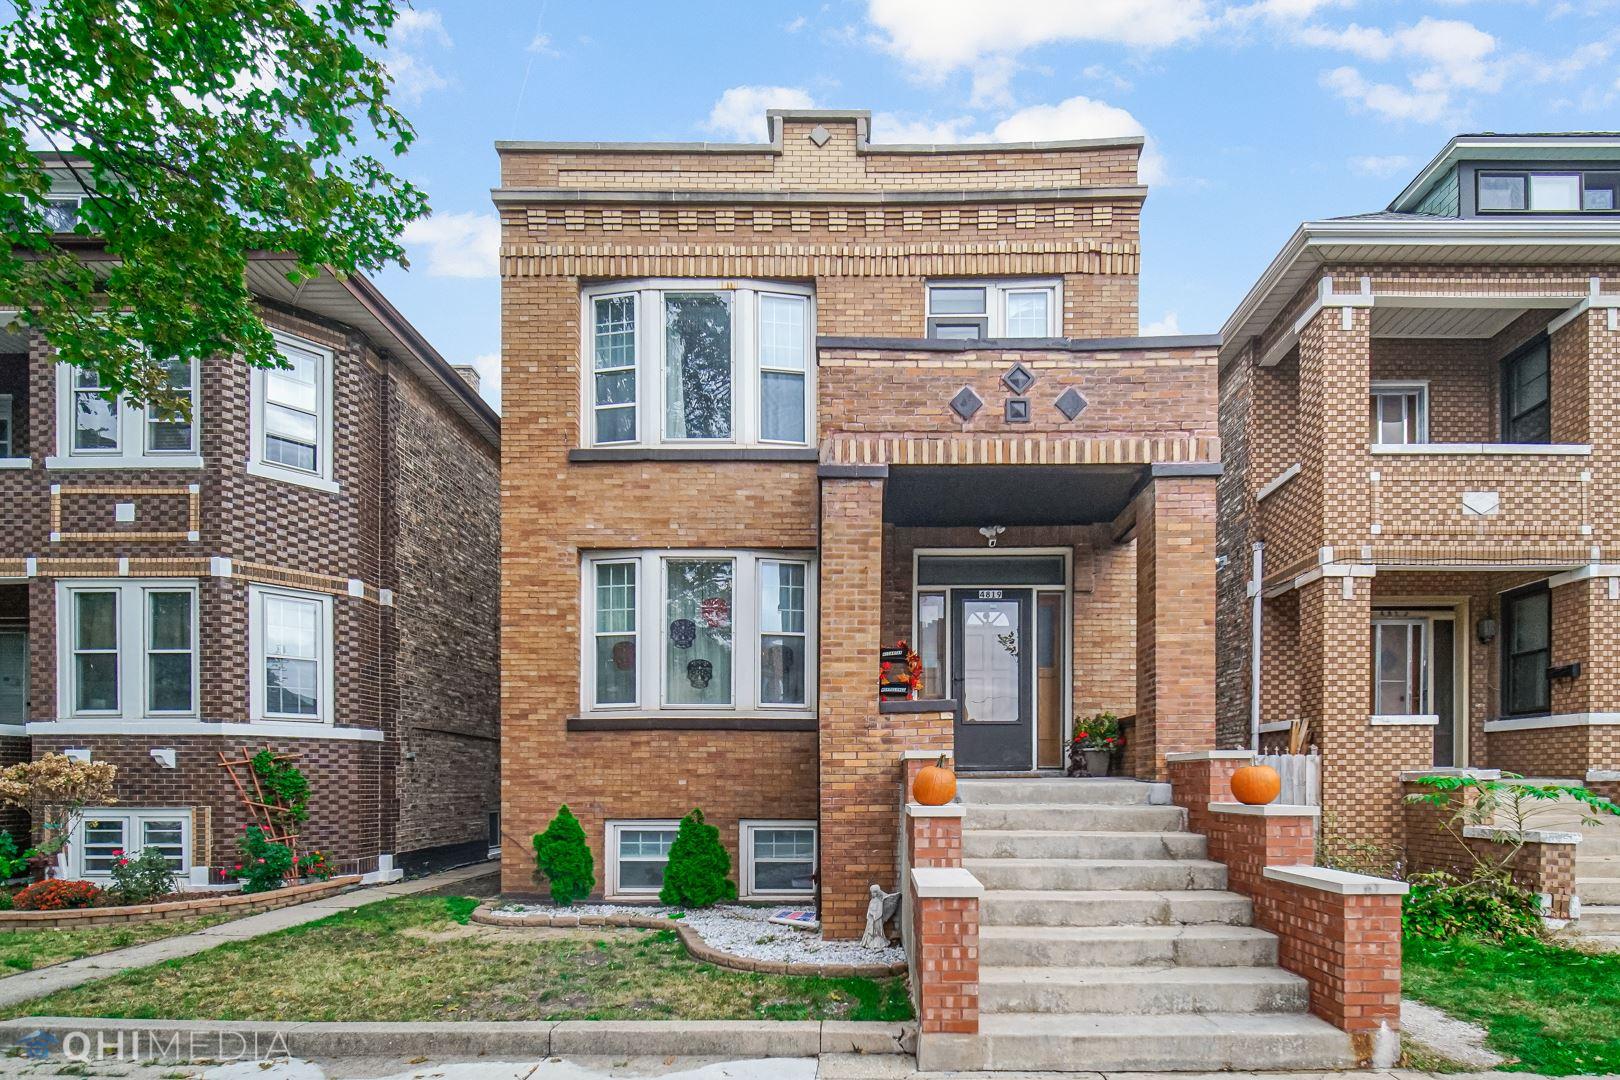 4819 S Keeler Avenue, Chicago, IL 60632 - #: 11240033